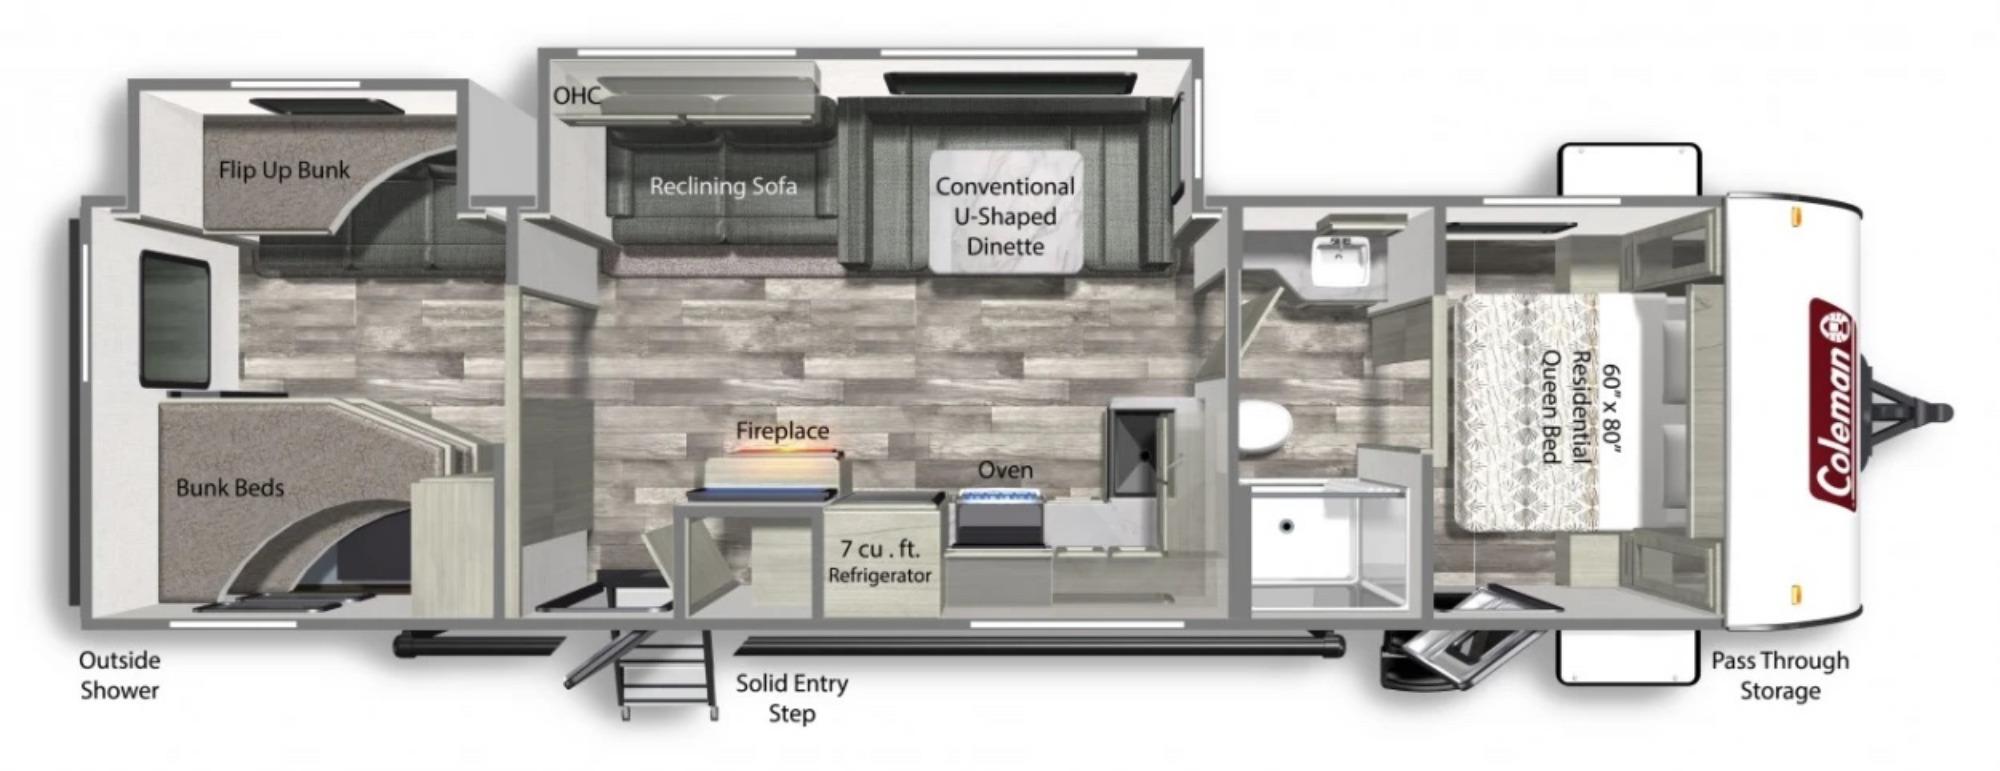 View Floor Plan for 2022 COLEMAN COLEMAN LIGHT 3215BH